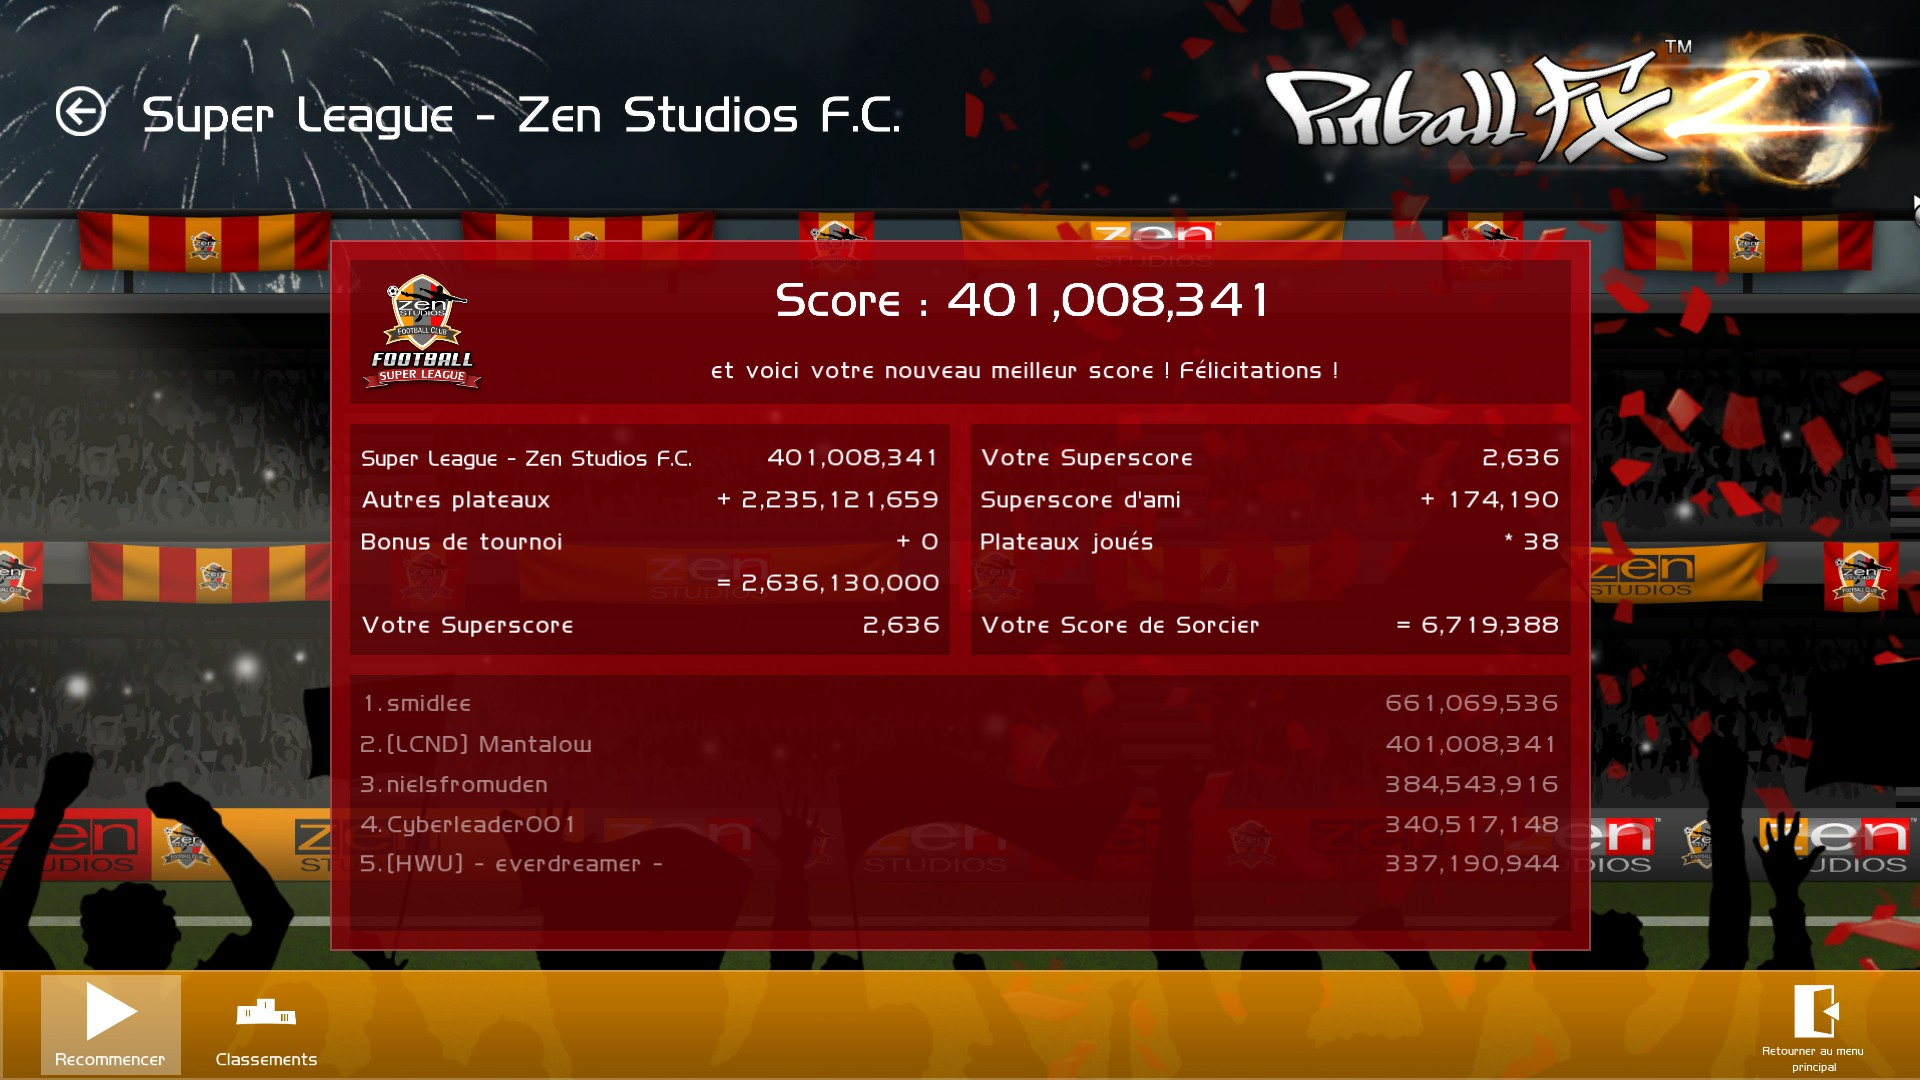 Mantalow: Pinball FX 2: Super League (PC) 401,008,341 points on 2015-03-05 10:07:26